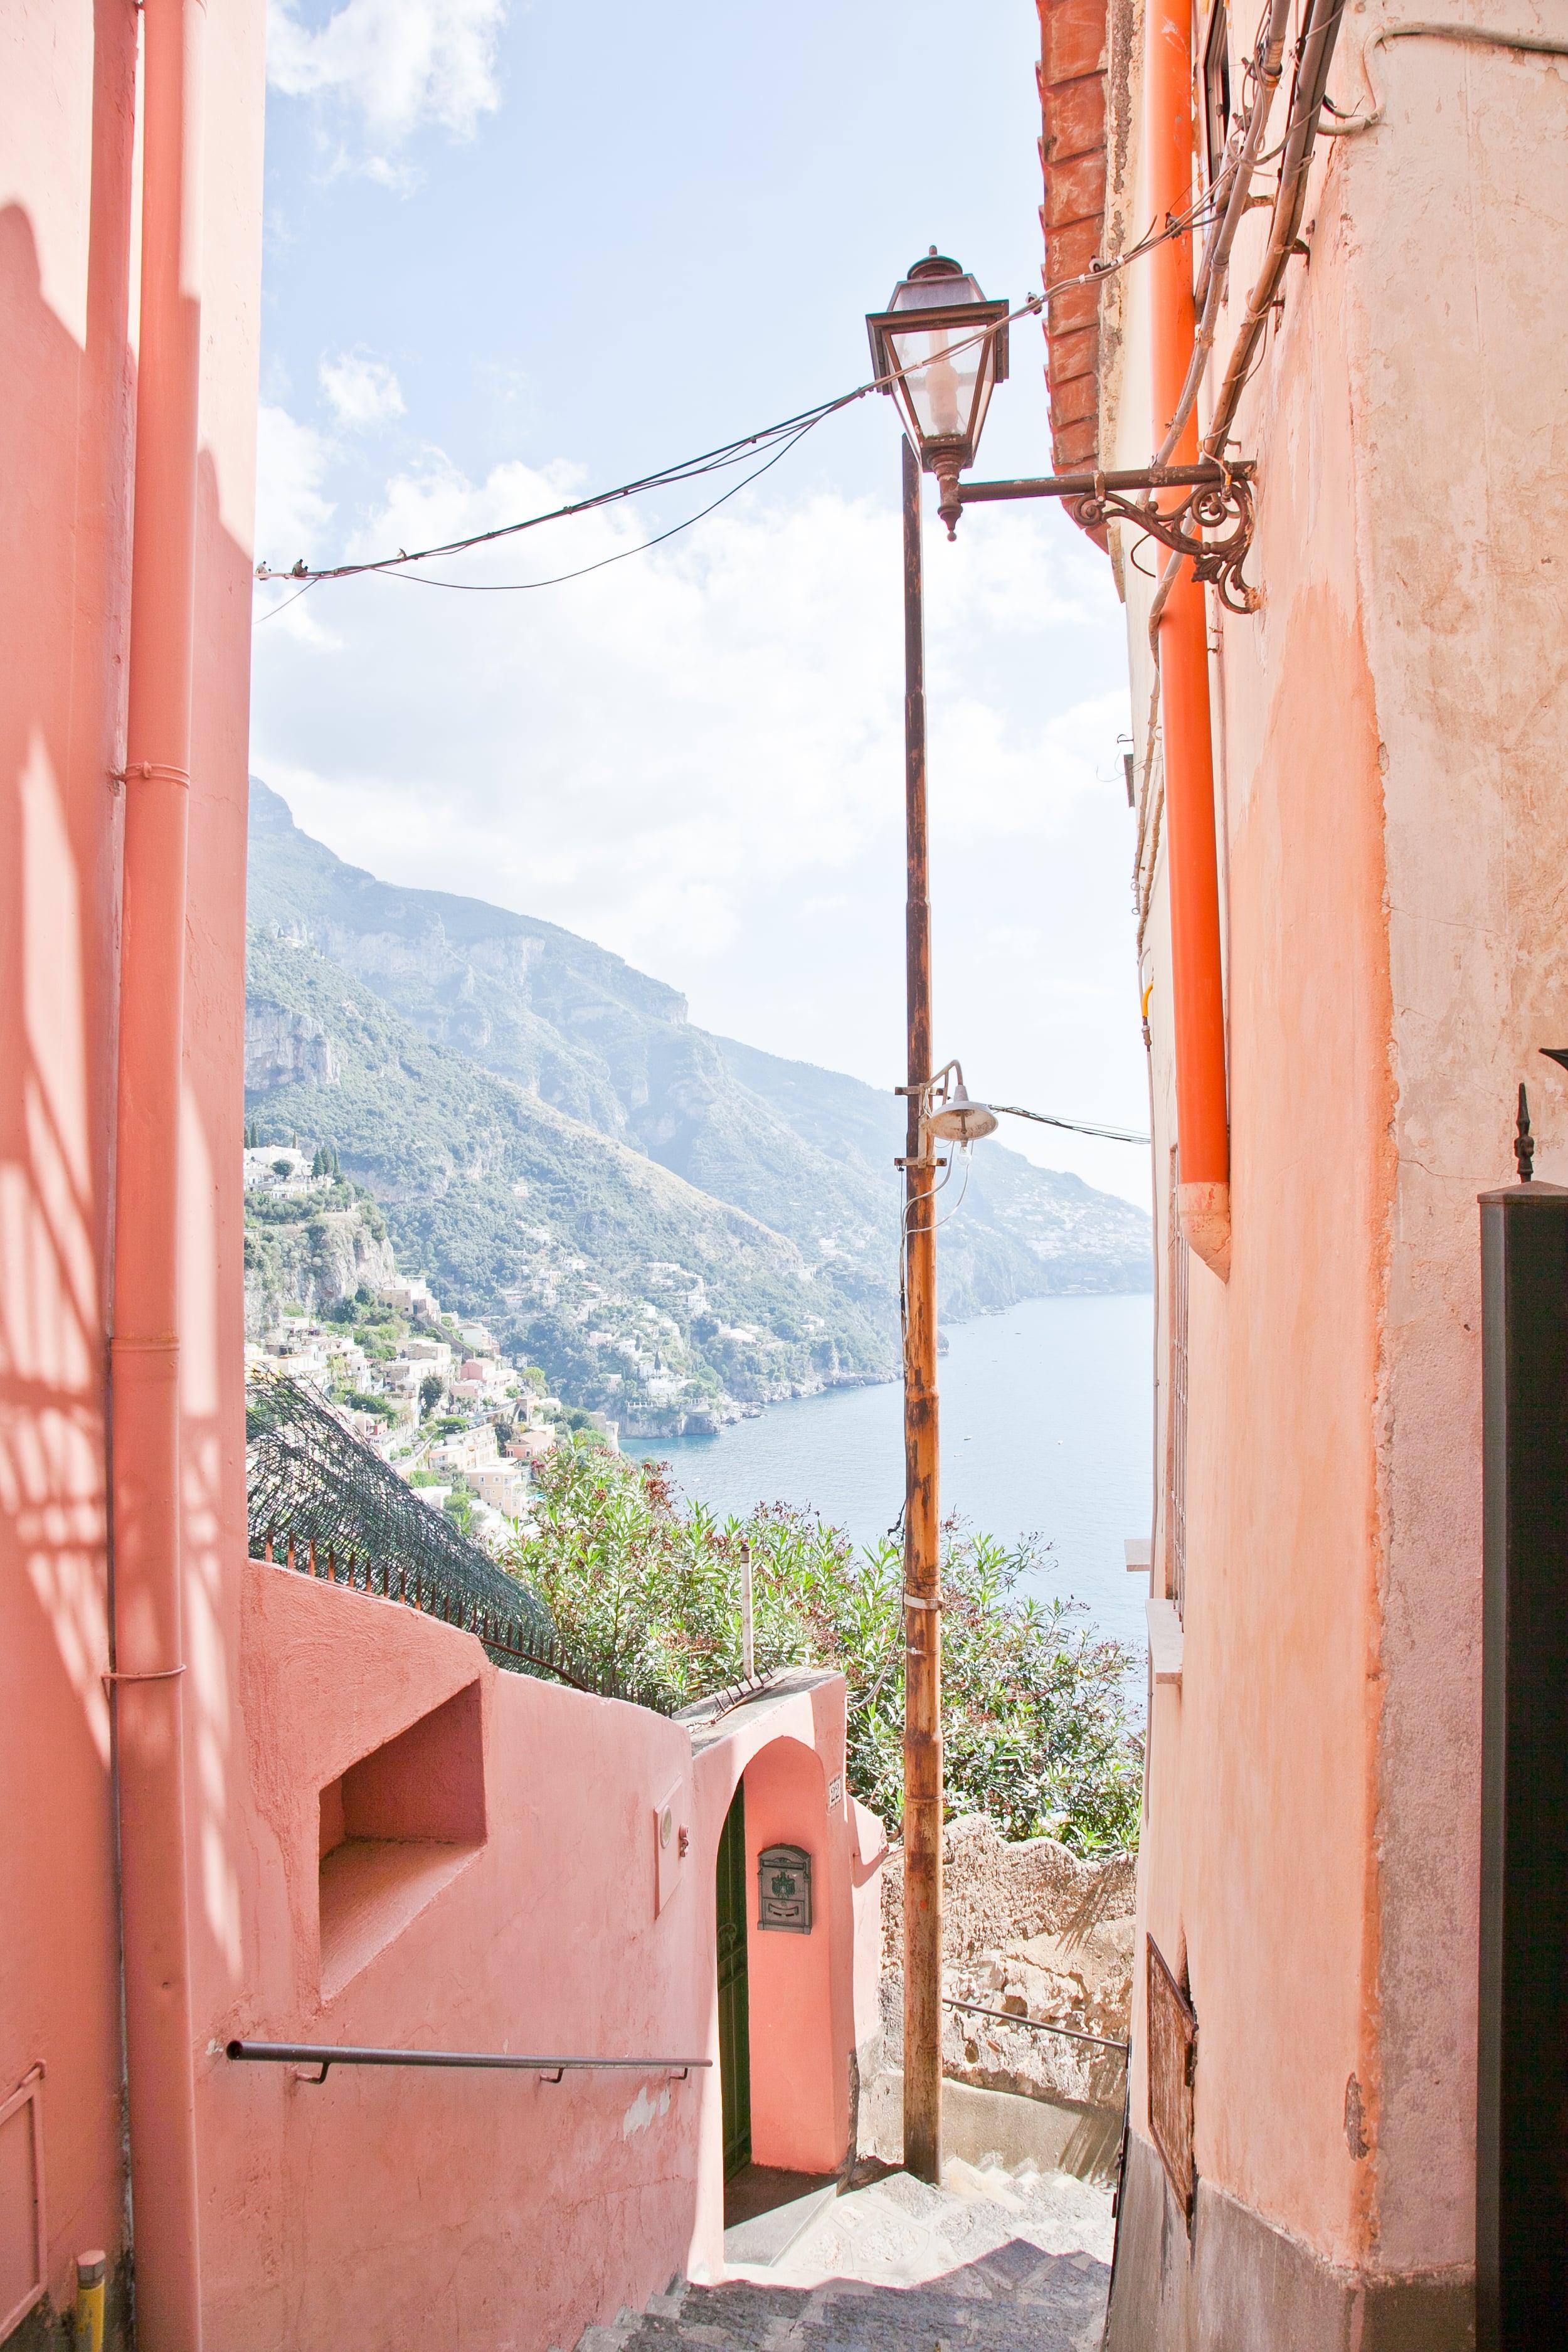 trisa-taro-alleyway-positano-amalfi coast-italy.jpg